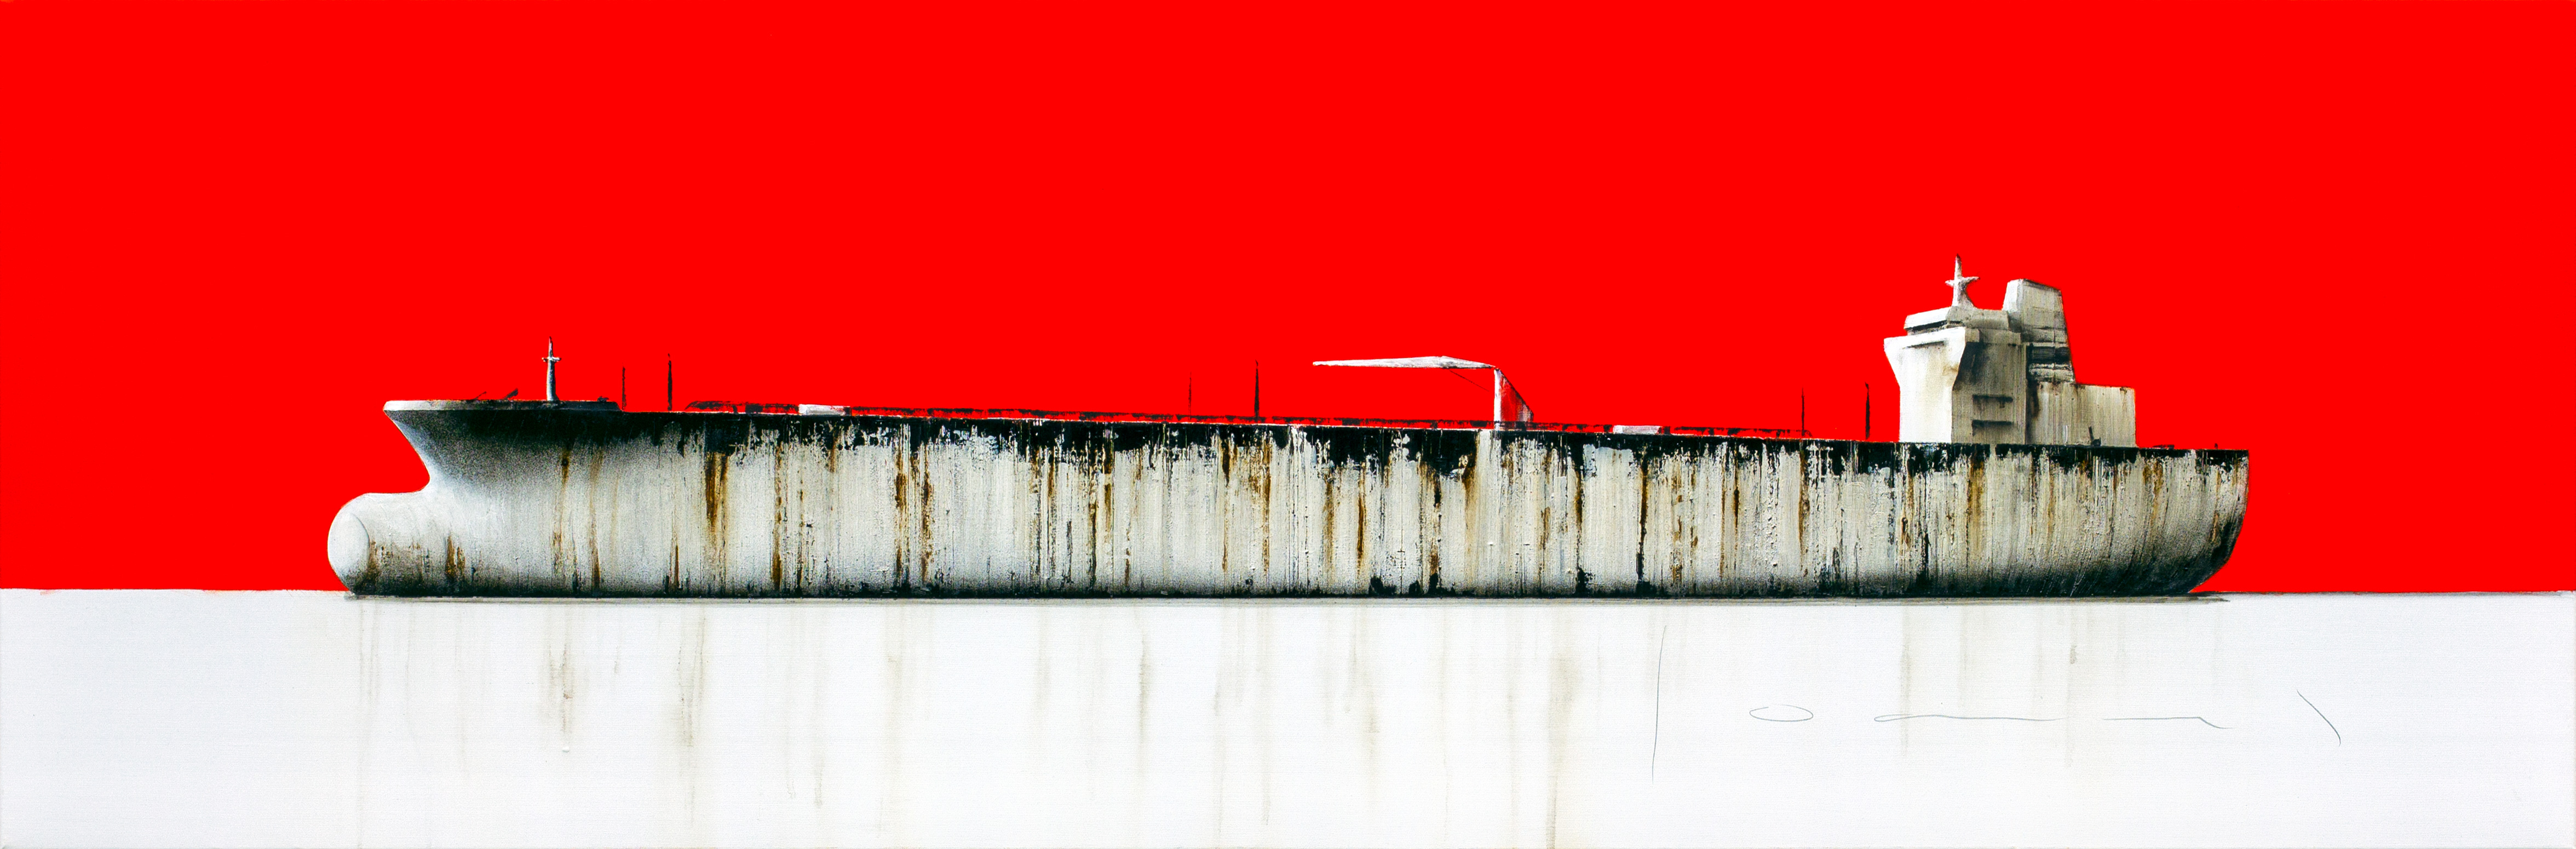 Tanker_n°_6__150_x_50_cm